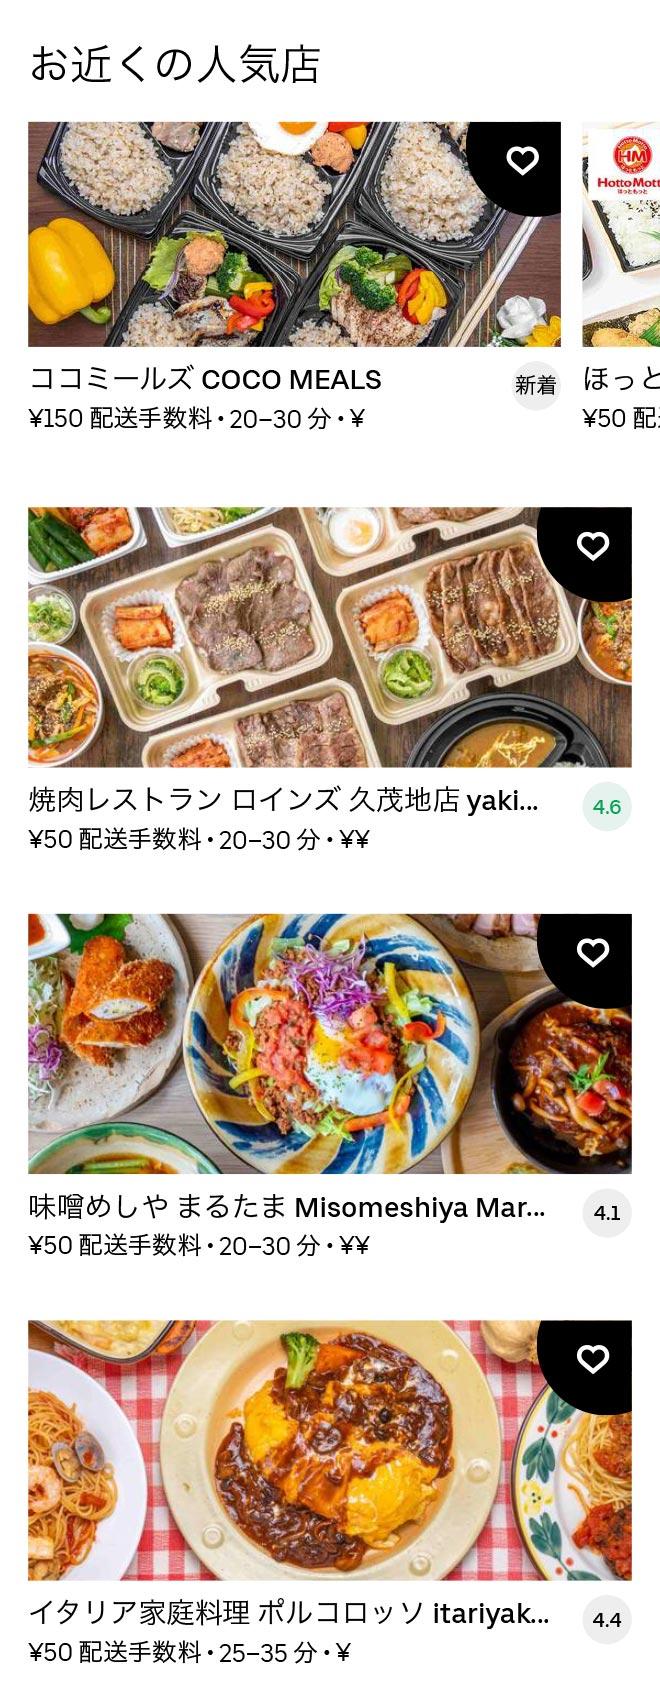 O kenchomae menu 2011 08